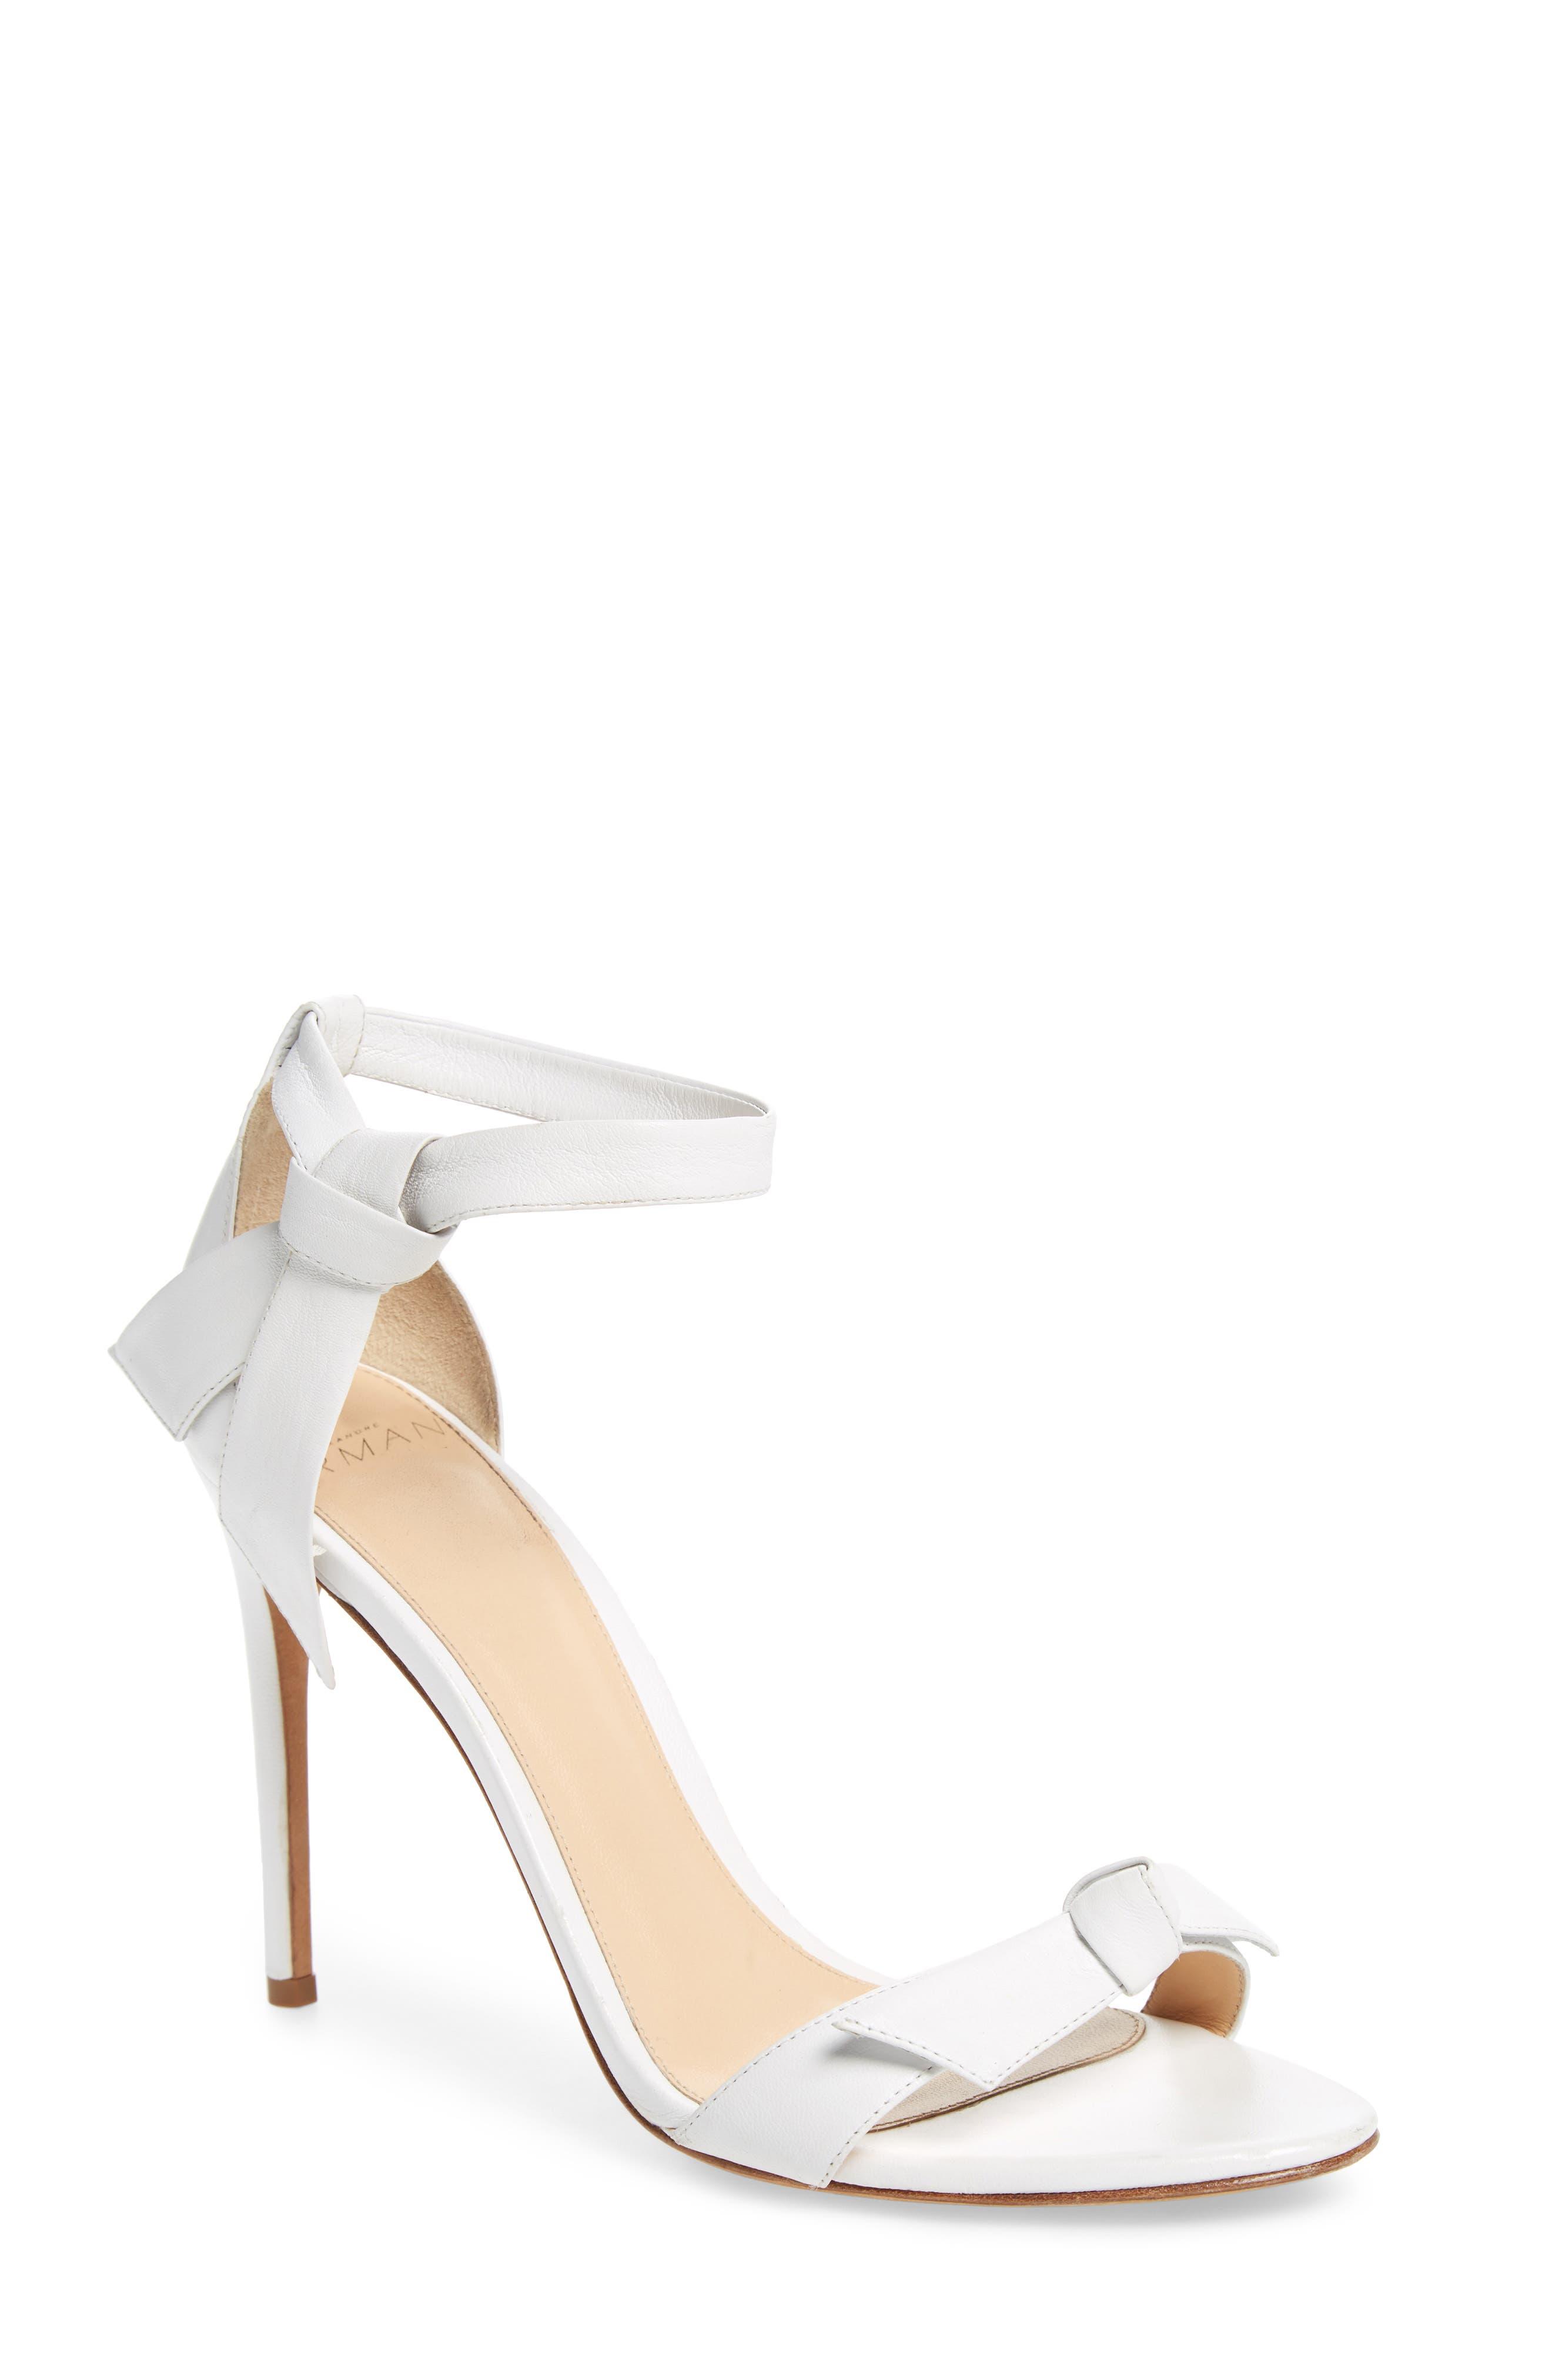 ALEXANDRE BIRMAN 'Clarita' Ankle Tie Sandal, Main, color, WHITE LEATHER